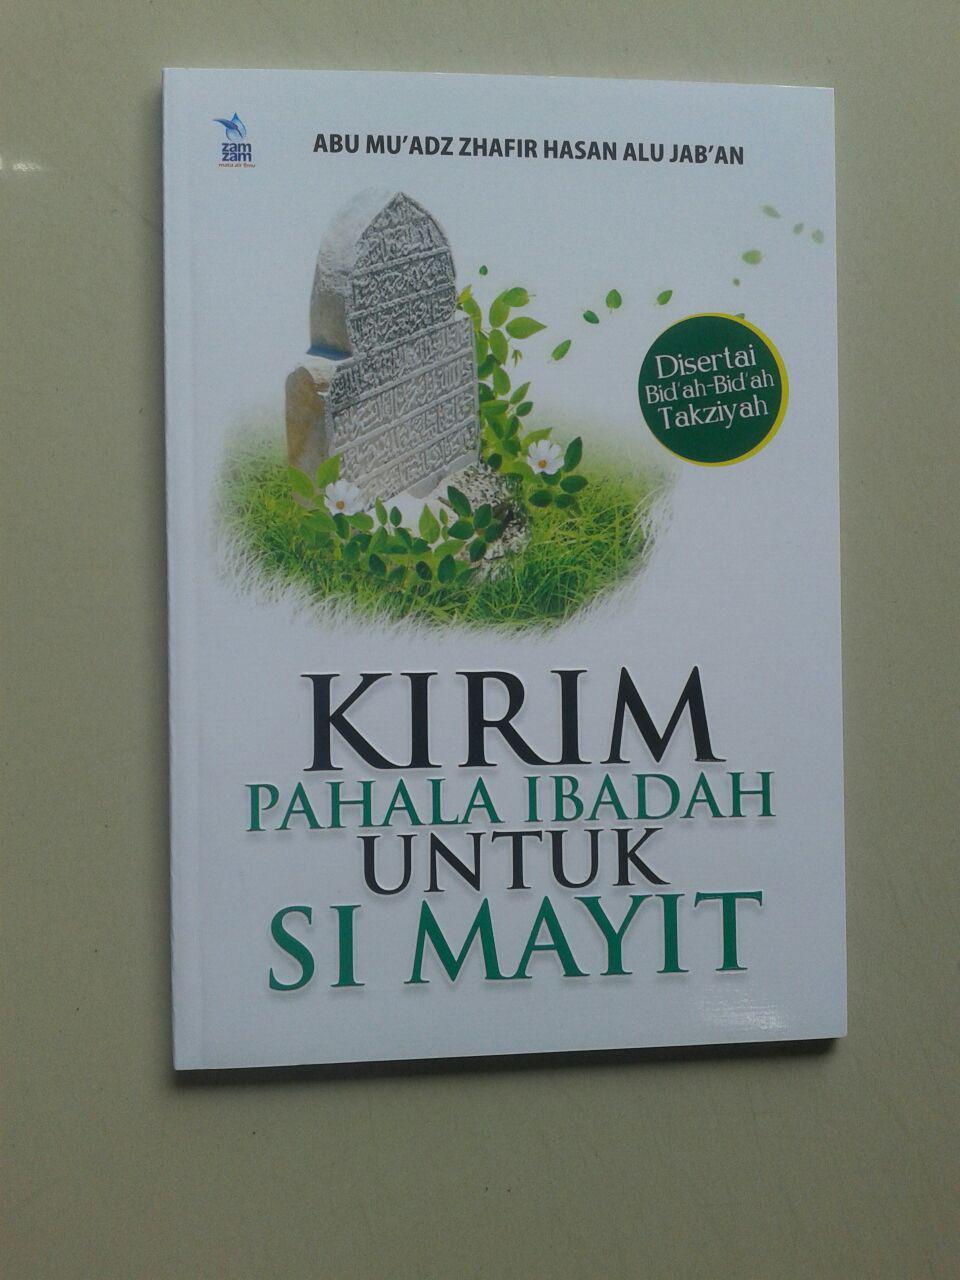 Buku Kirim Pahala Ibadah Untuk Si Mayit cover 2